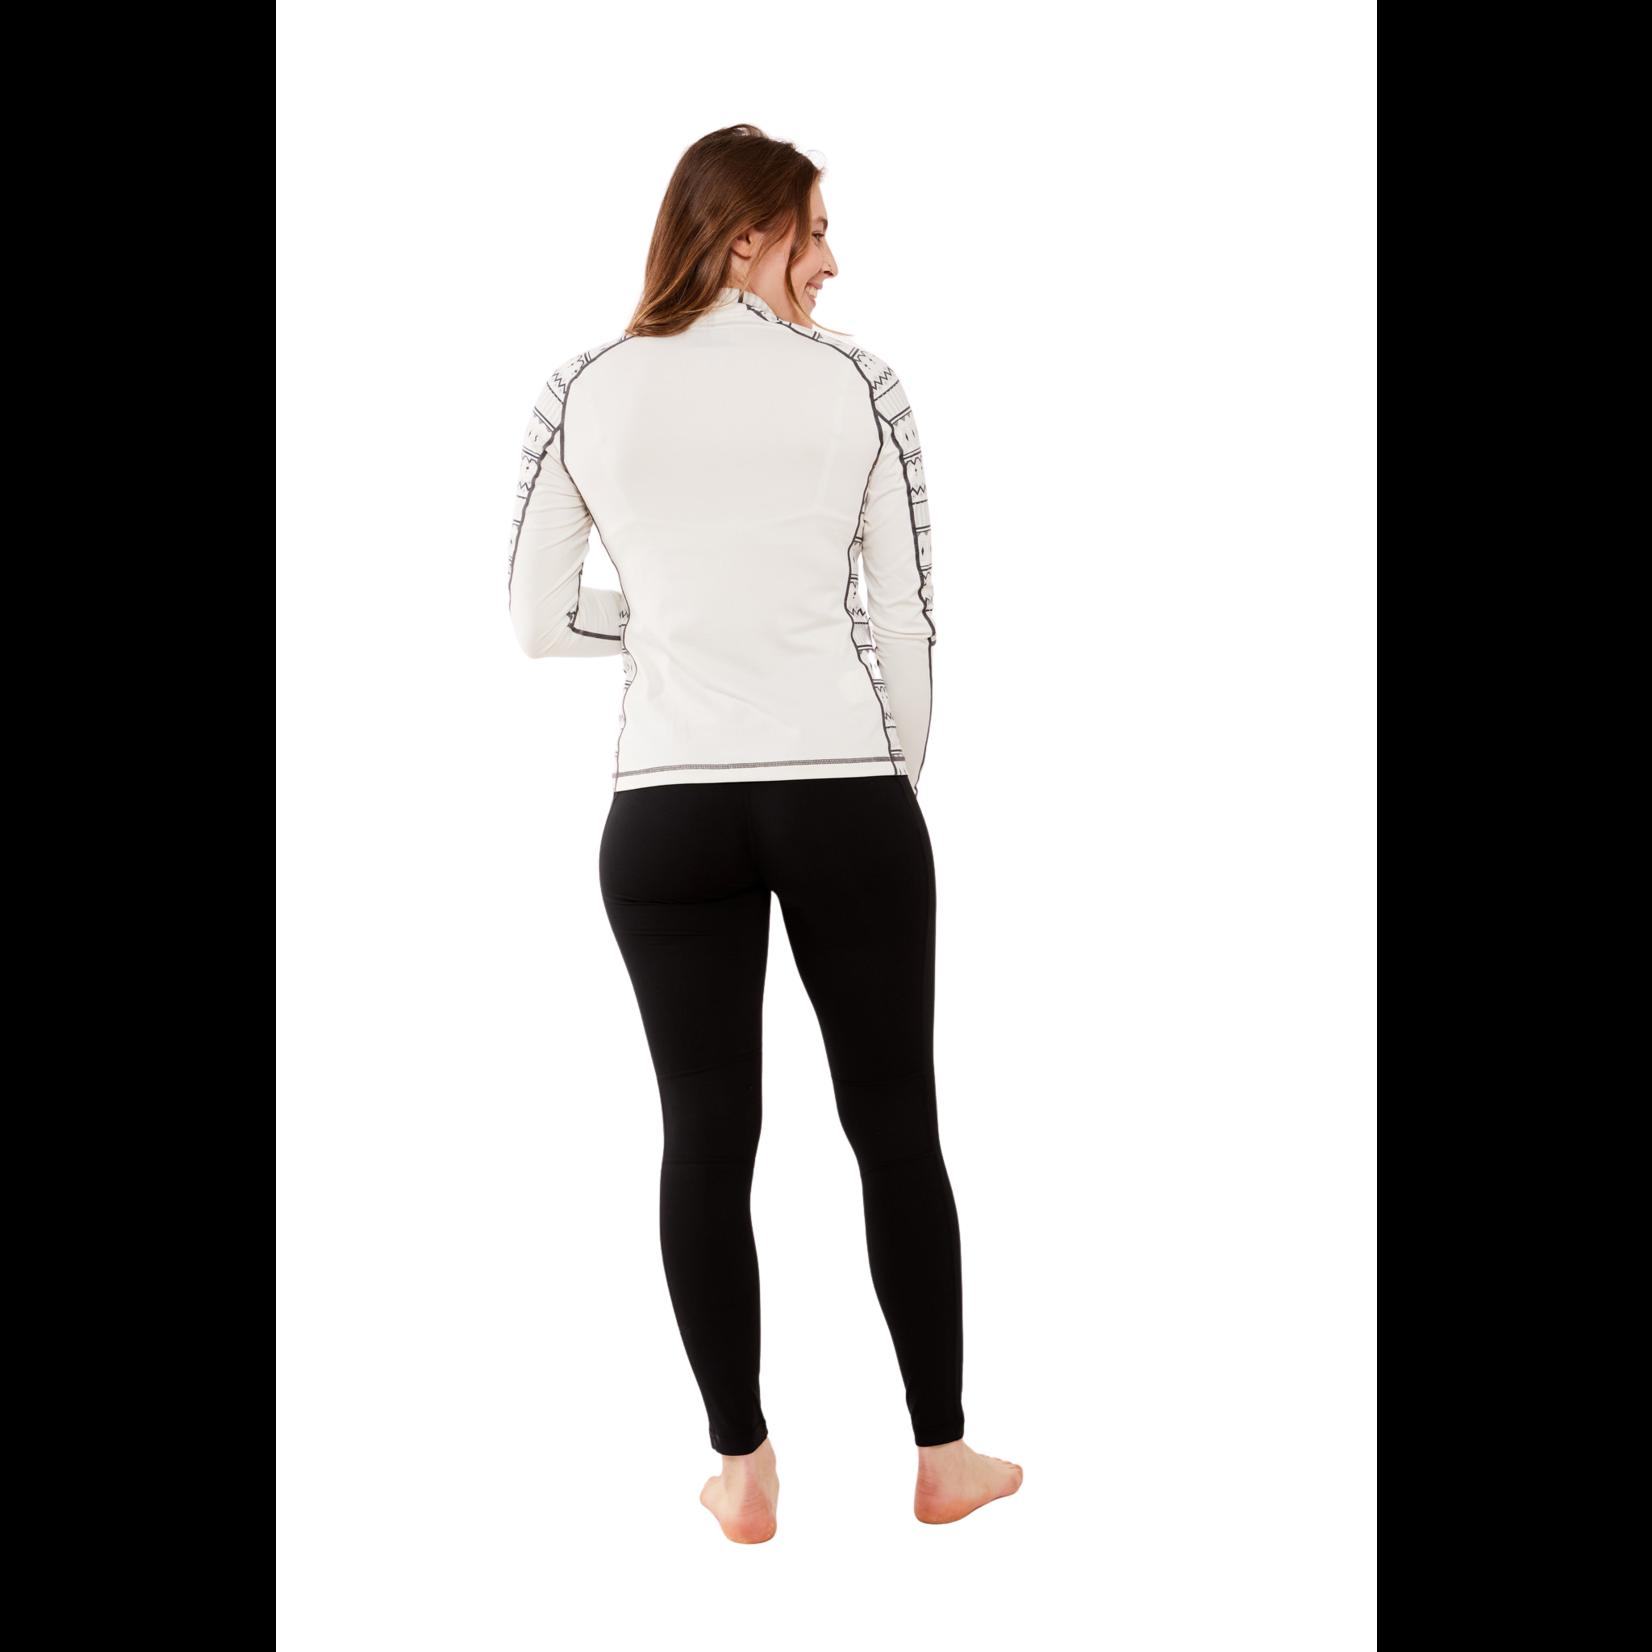 Swix Swix Tista 1/2 Zip Sweatshirt Women's